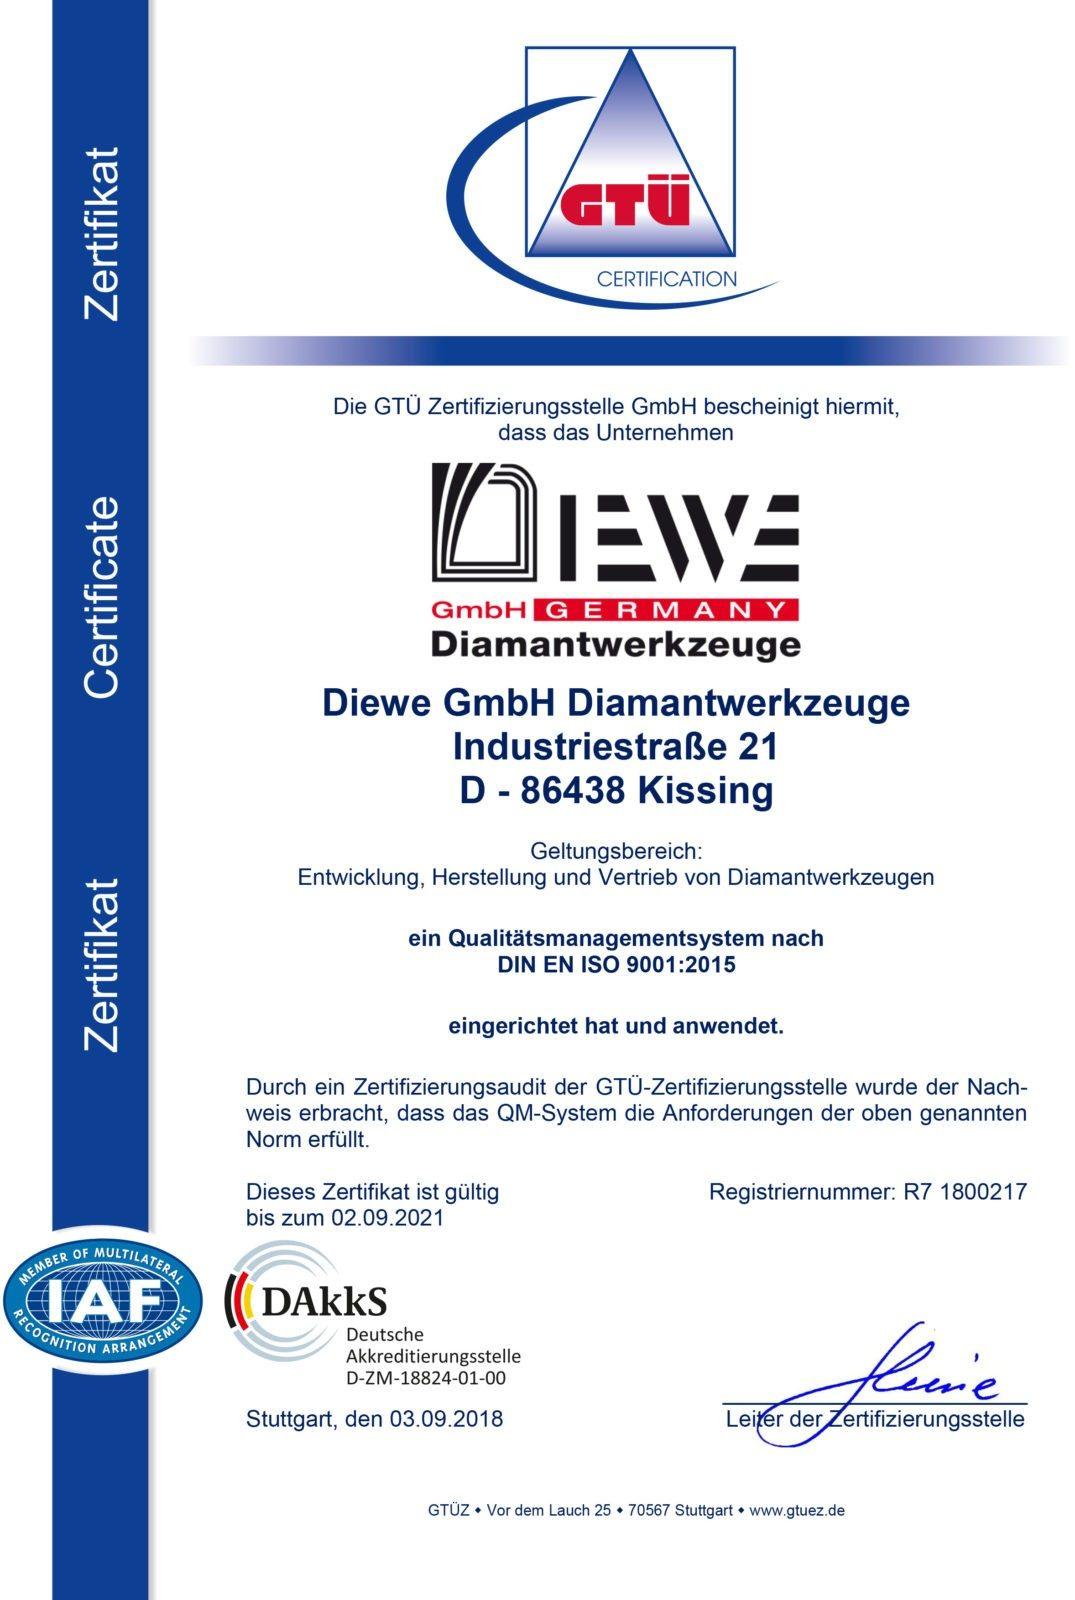 F209iaf_Reg8_Zertifikat_9001_Hauptzertifikat mit Logo - Rev 01 -